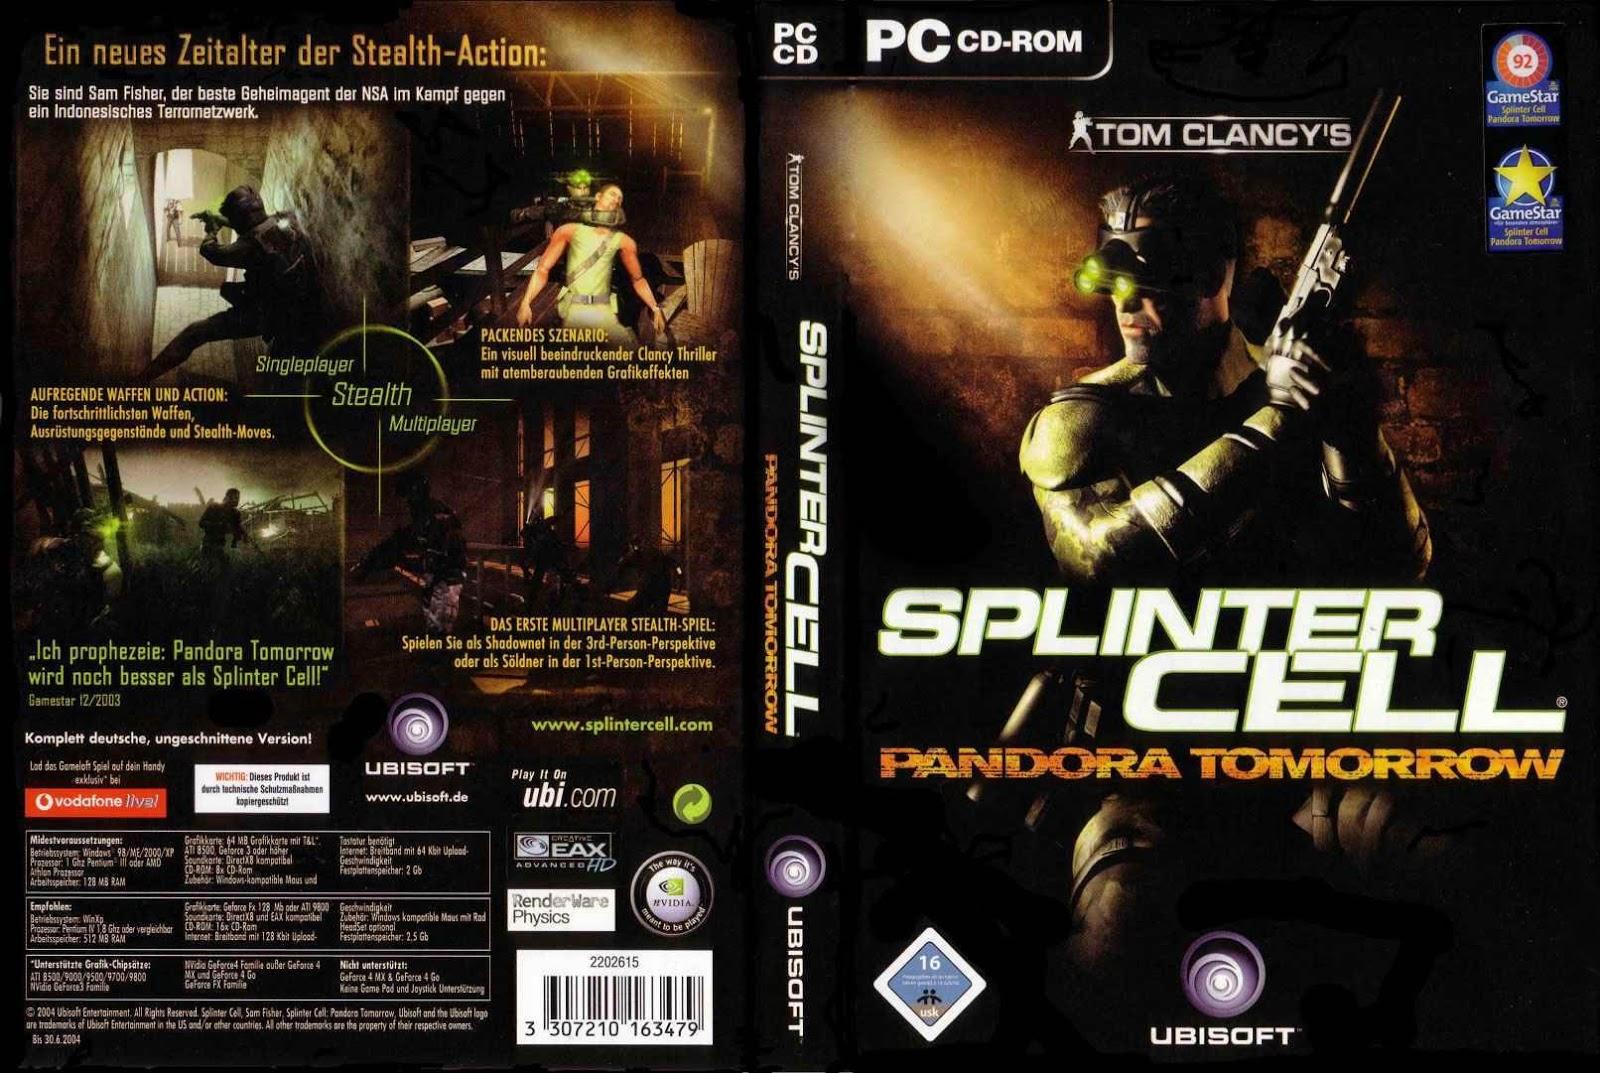 Gamesfx: download splinter cell pandora tomorrow full rip pc game.